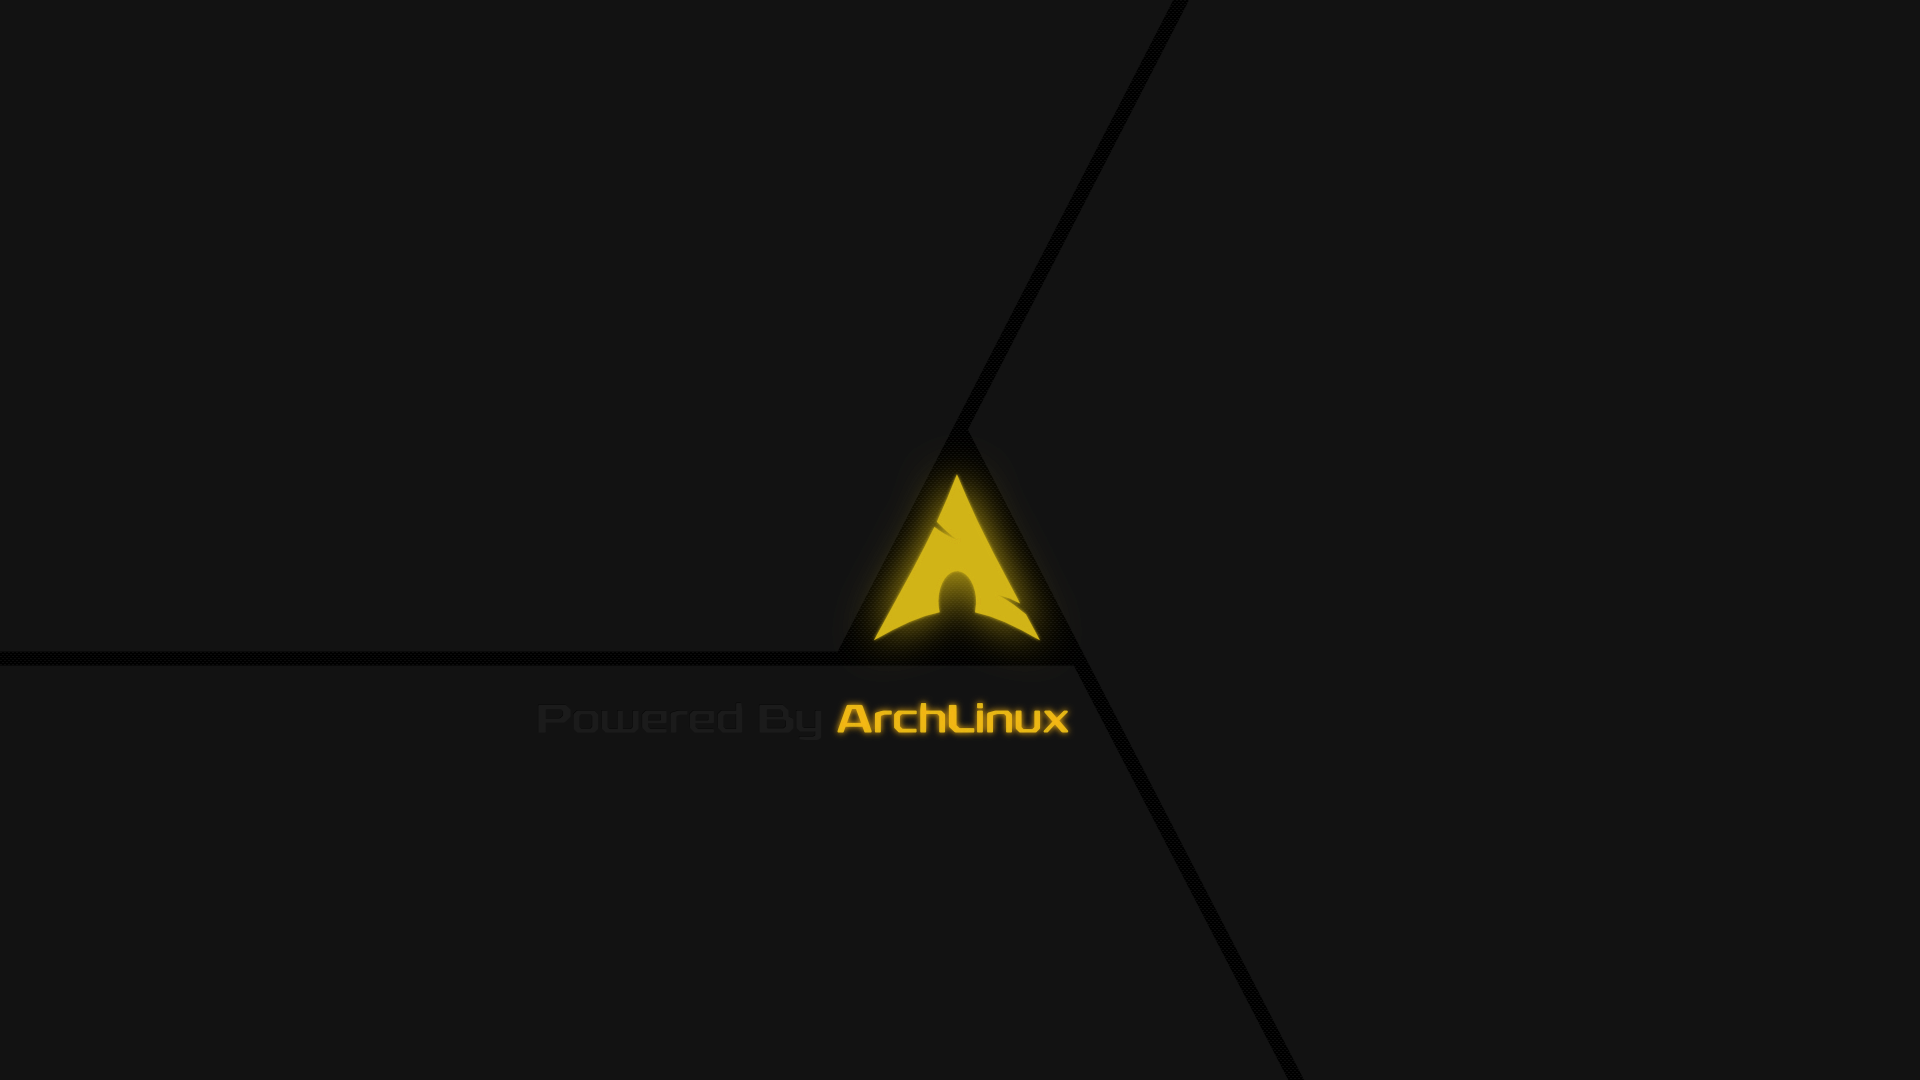 Arch Linux wallpaper   565680 1920x1080